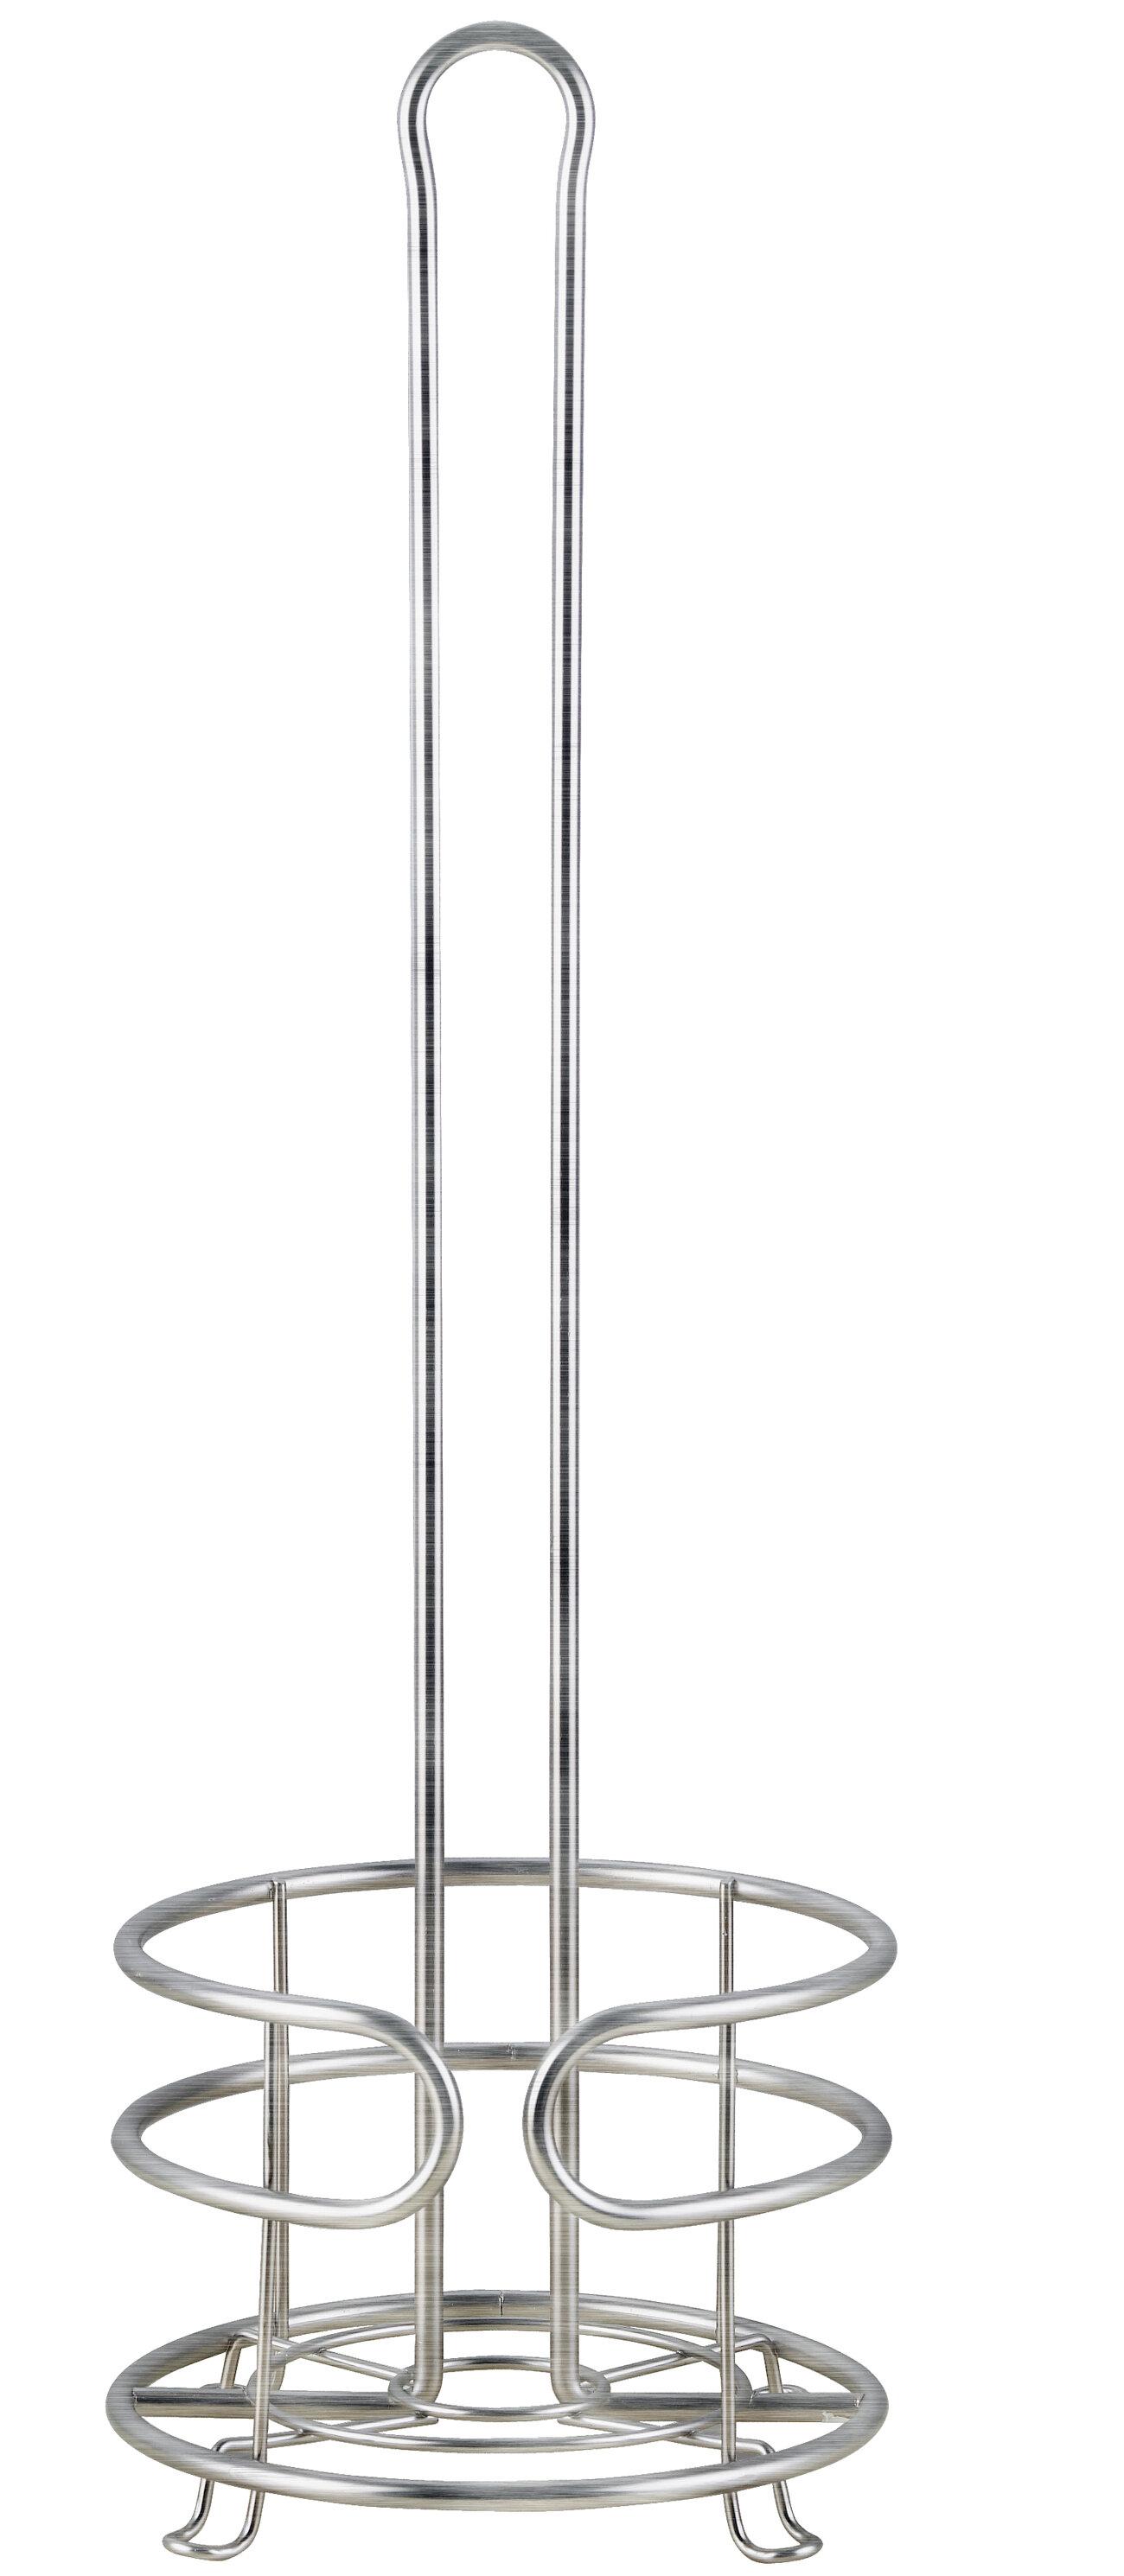 Iron Metal Standing TOILET PAPER Holder Tissue Floor Stand Rack Bathroom Decor Tripar